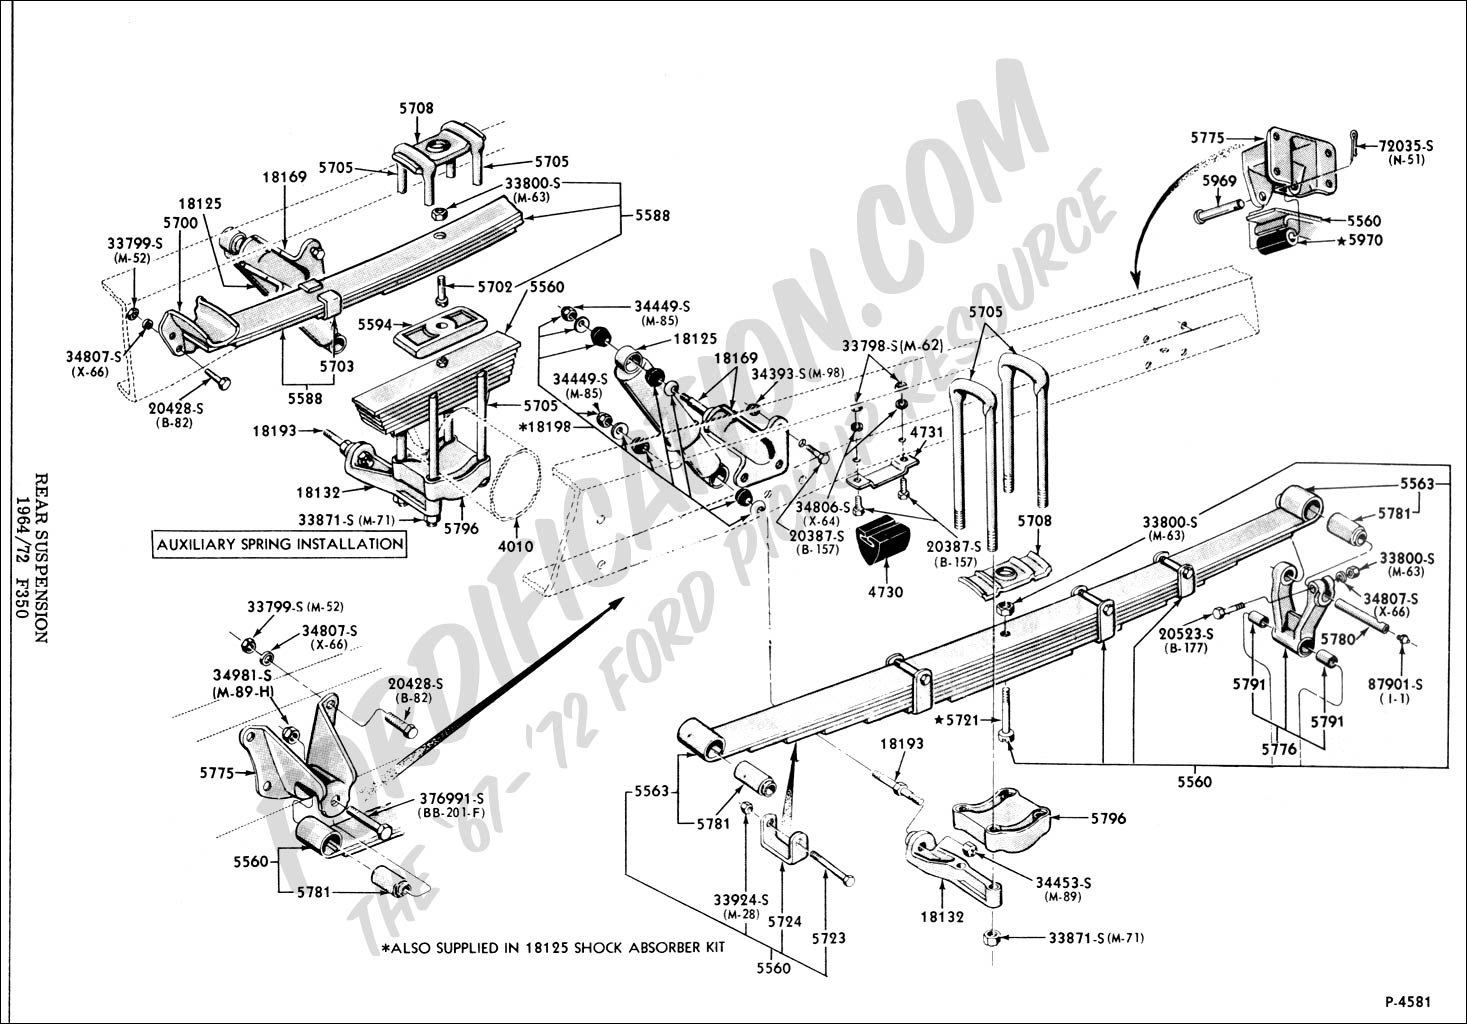 Pleasing 2001 Ford Ranger Parts Diagram Wiring Diagram Data Schema Wiring Cloud Itislusmarecoveryedborg